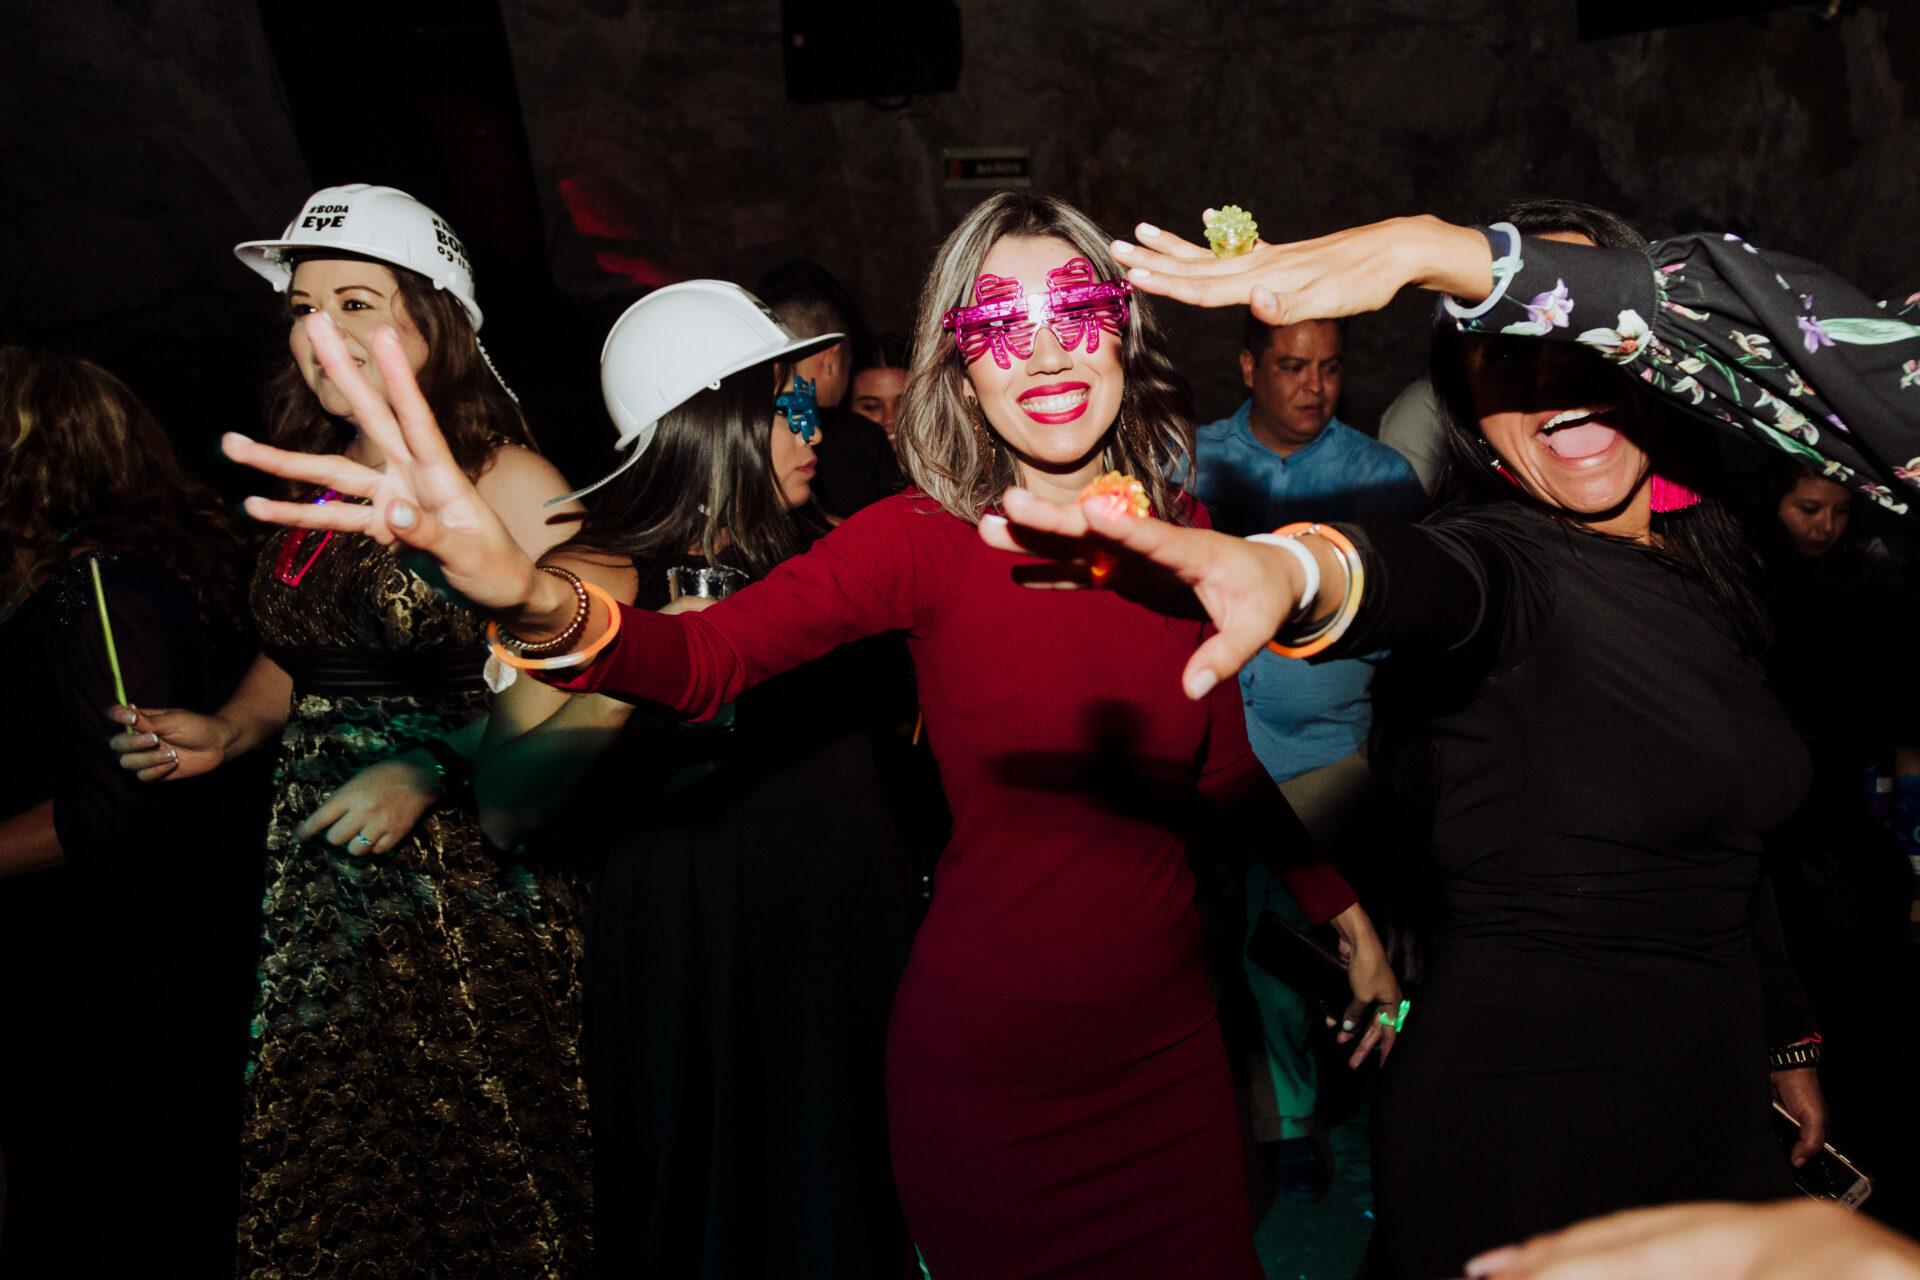 javier_noriega_fotografo_bodas_la_mina_club_zacatecas_wedding_photographer33